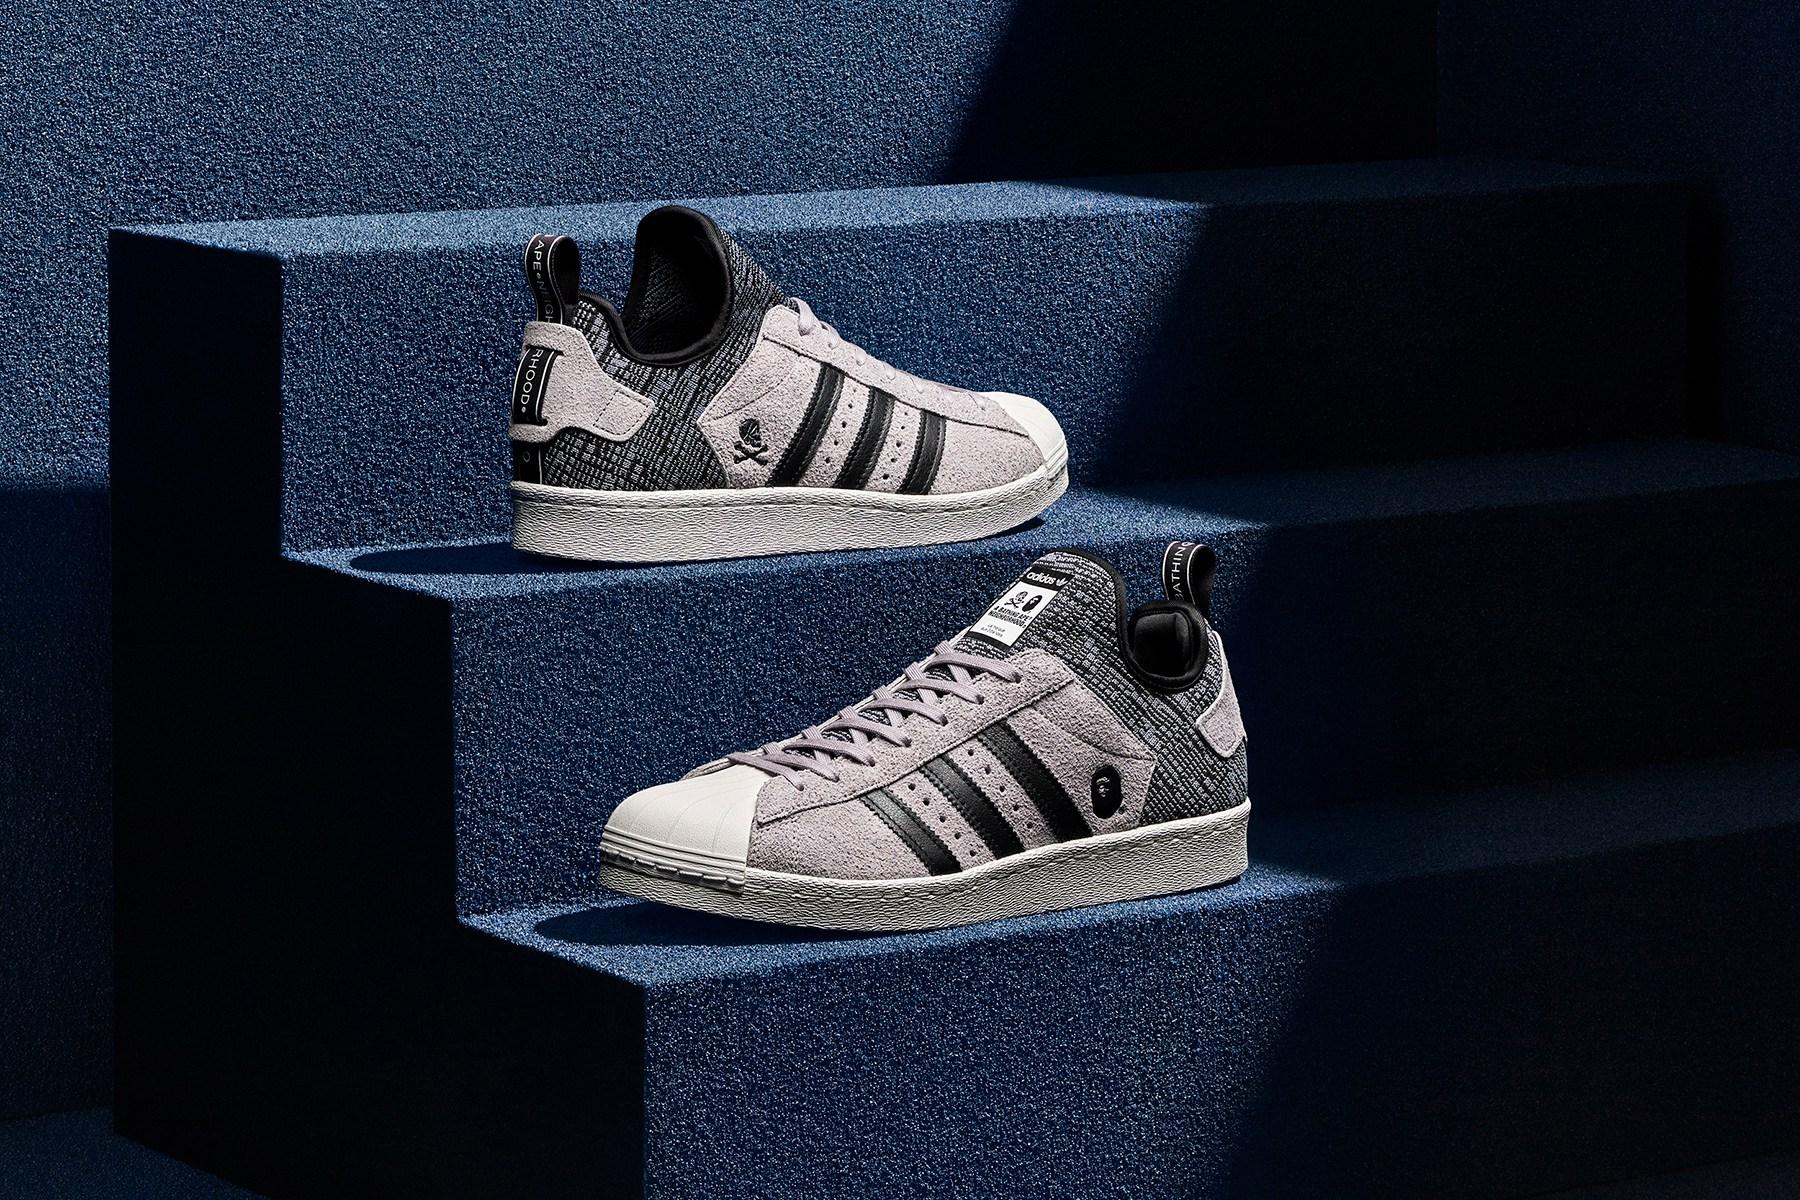 adidas-originals-bape-neighborhood-superstar-boost-1